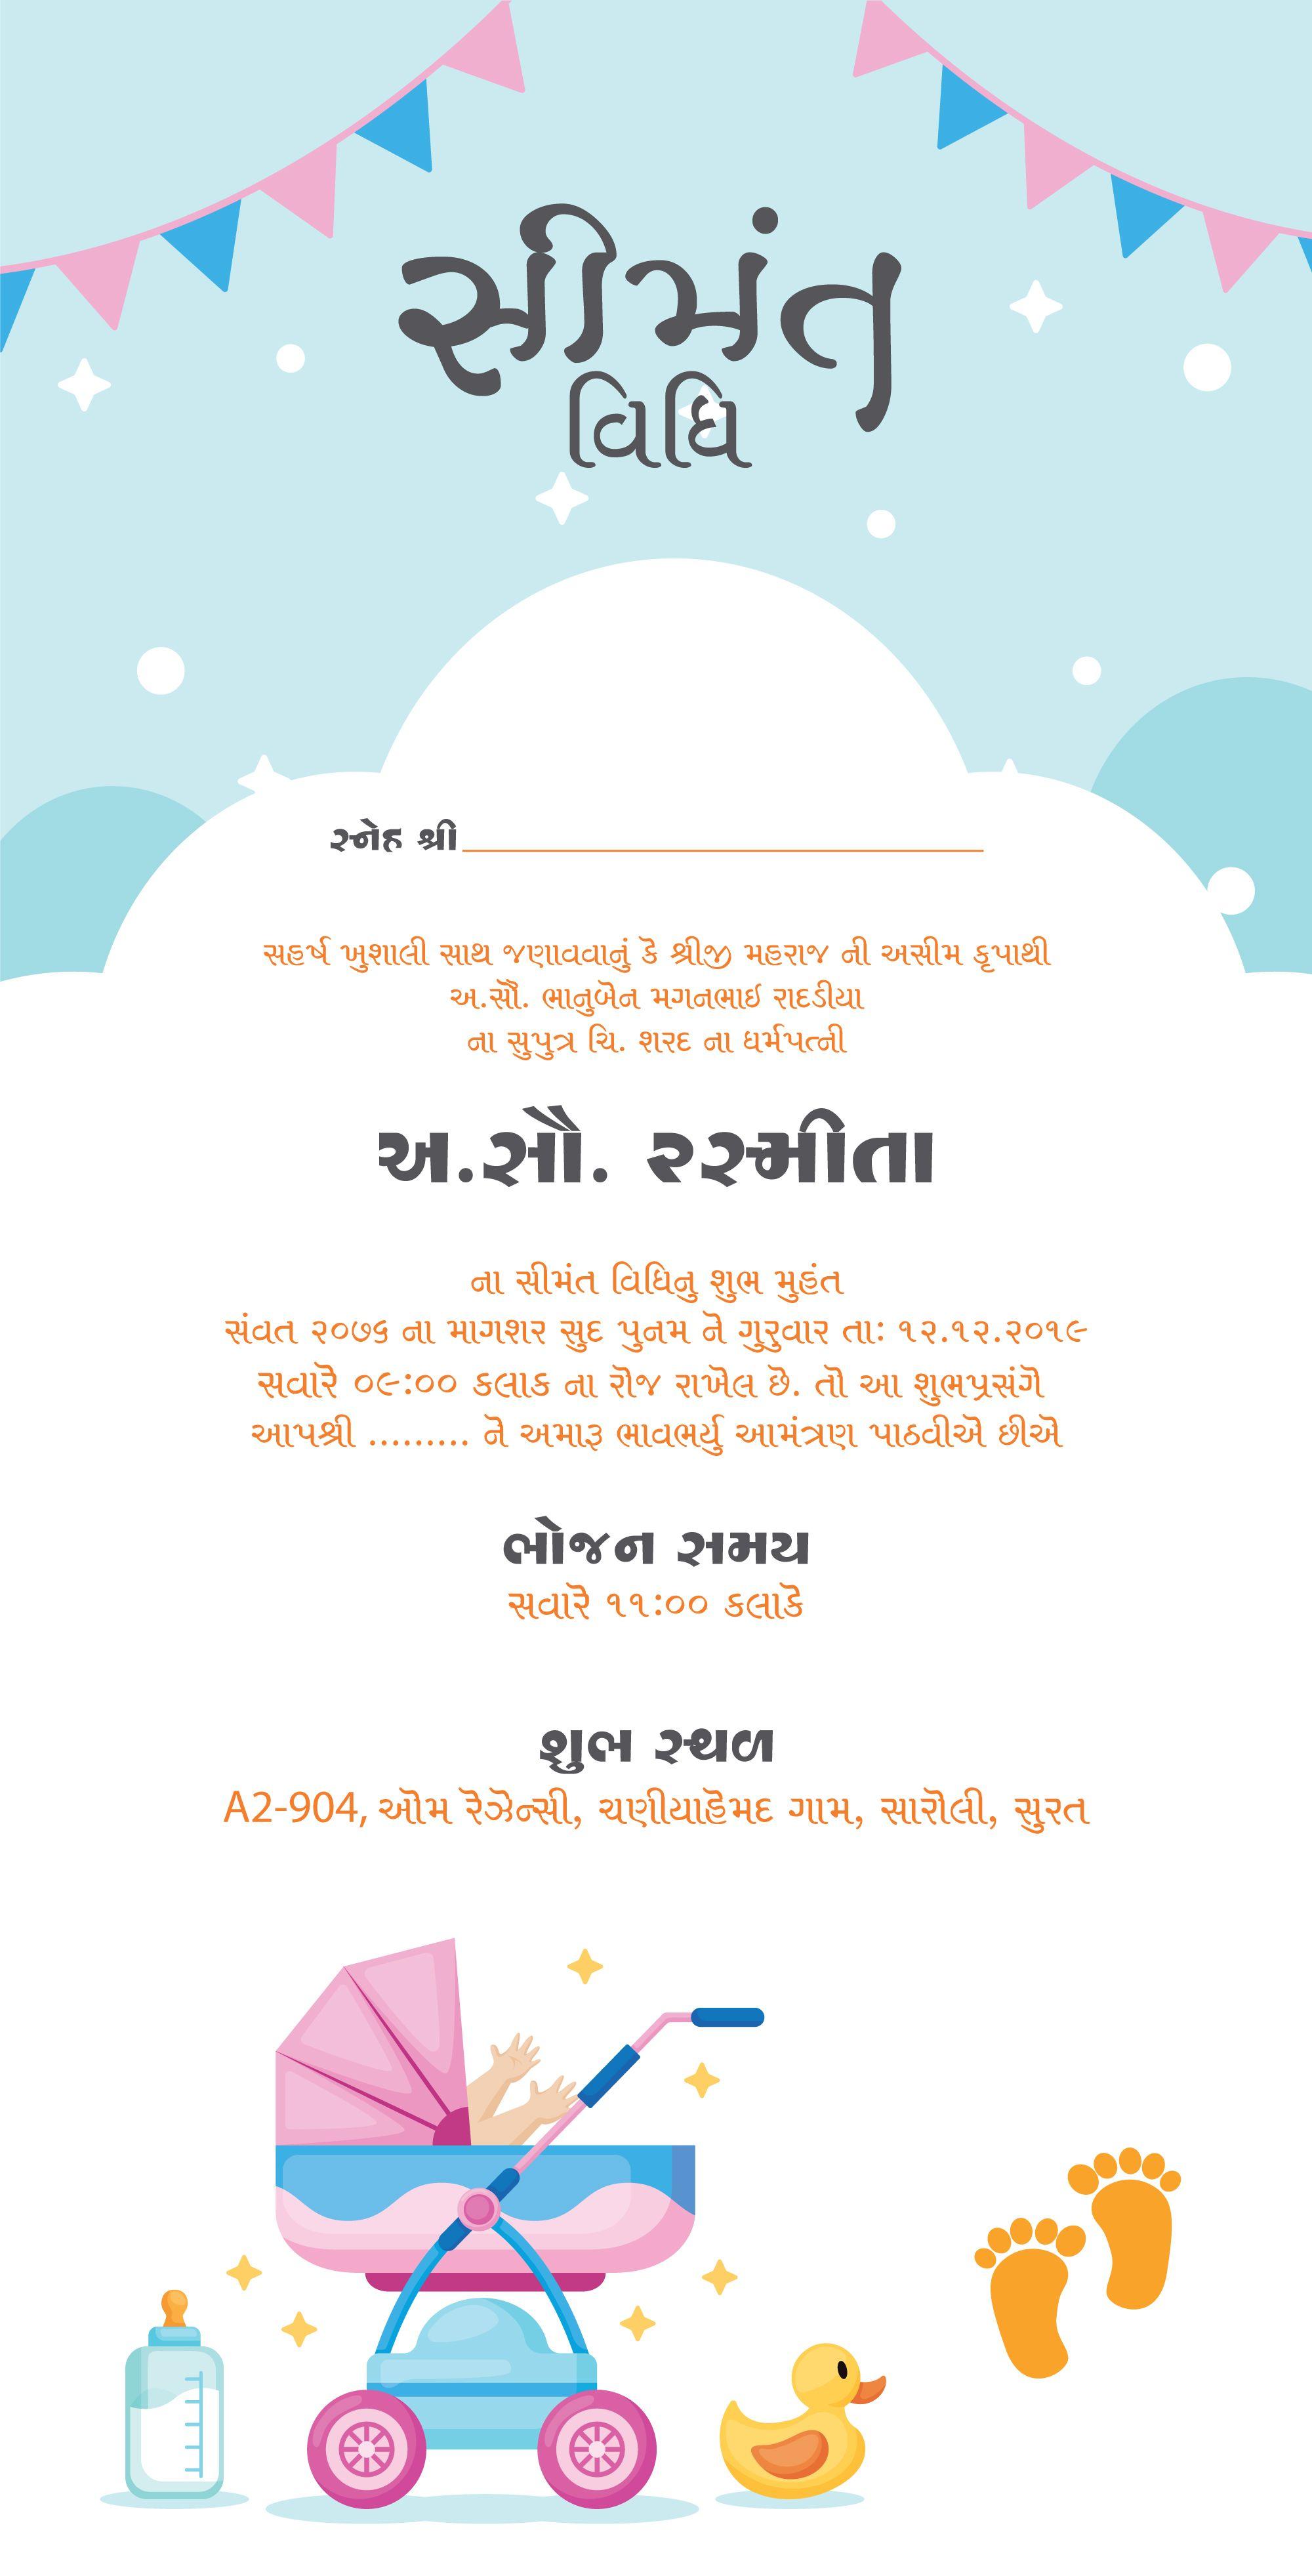 Shrimant Vidhi Gujarati Card : shrimant, vidhi, gujarati, Shower, Invitation, Blush, Simant, Vidhi, Cards,, Wedding, Design,, Invitations, Design